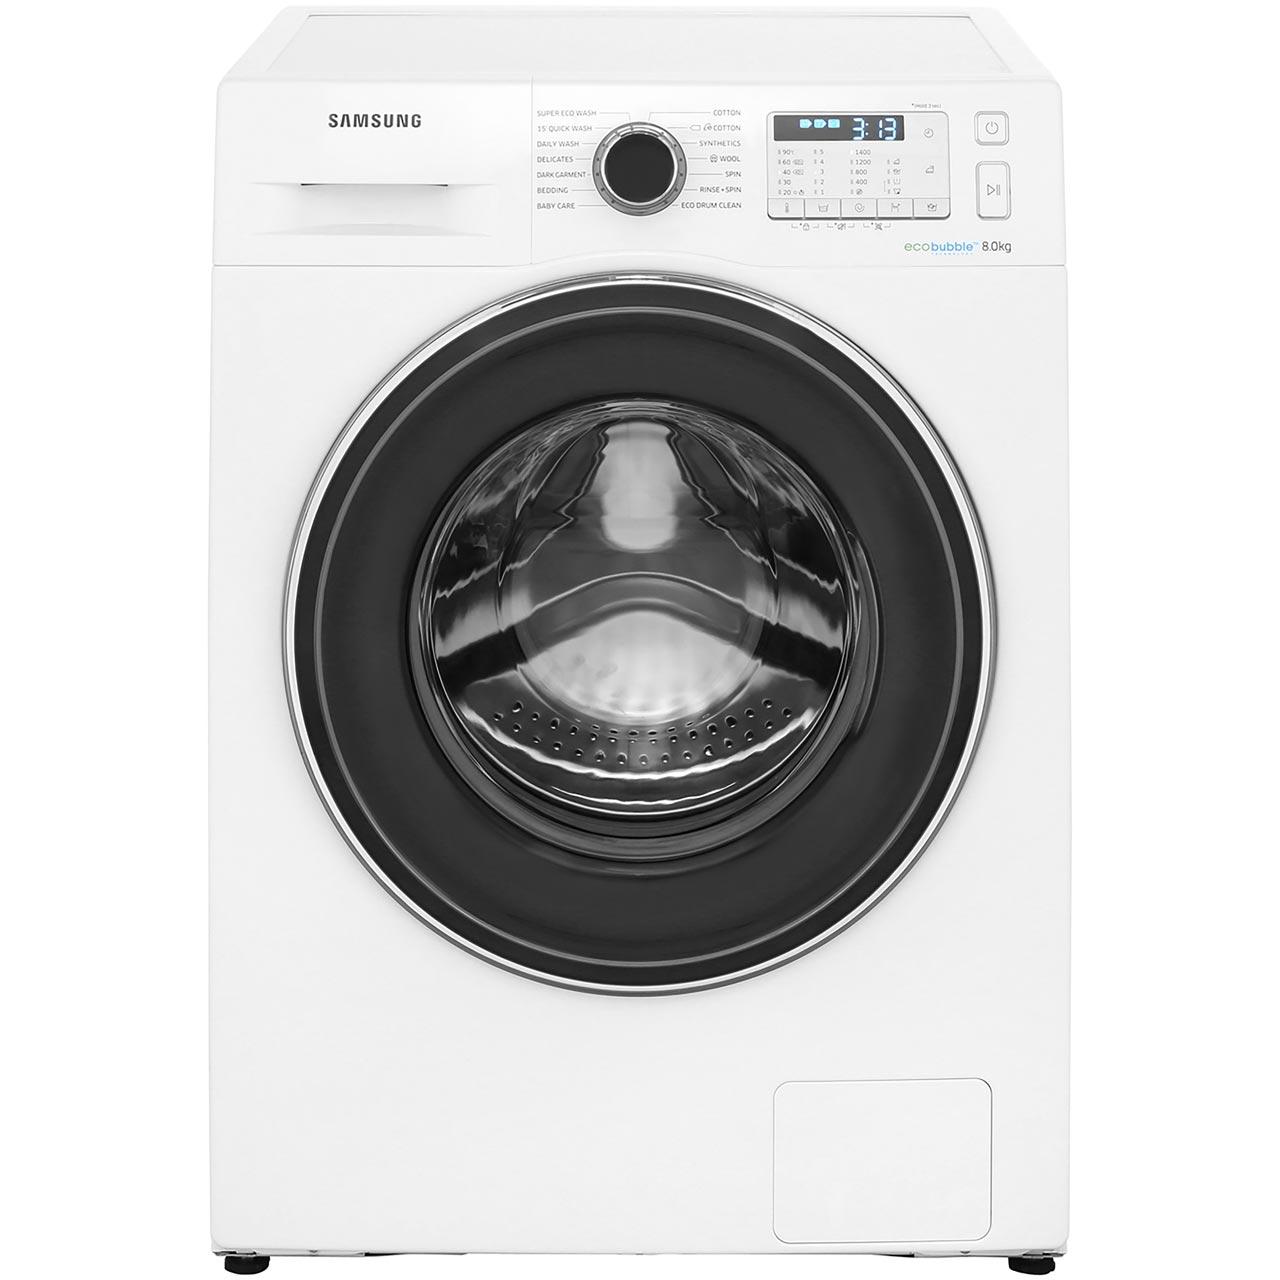 Ao.com - Samsung 8kg ecobubble washing machine £359 with code plus 5 year warranty